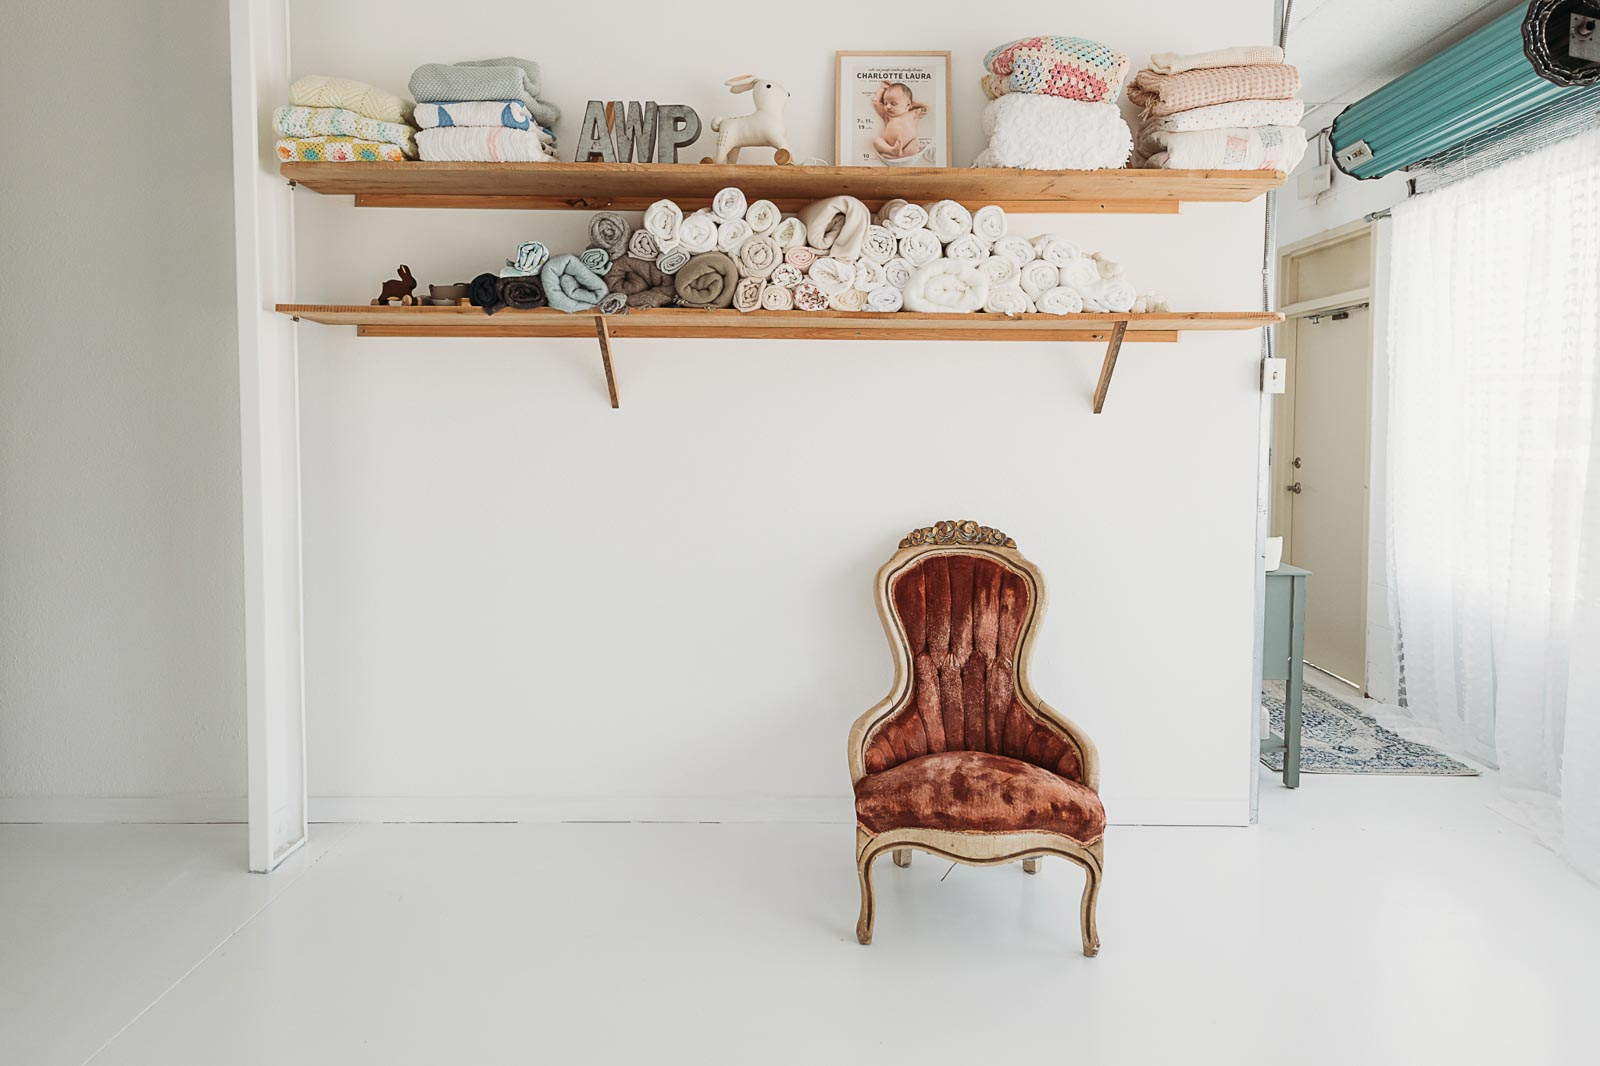 Photography studio renovation - After